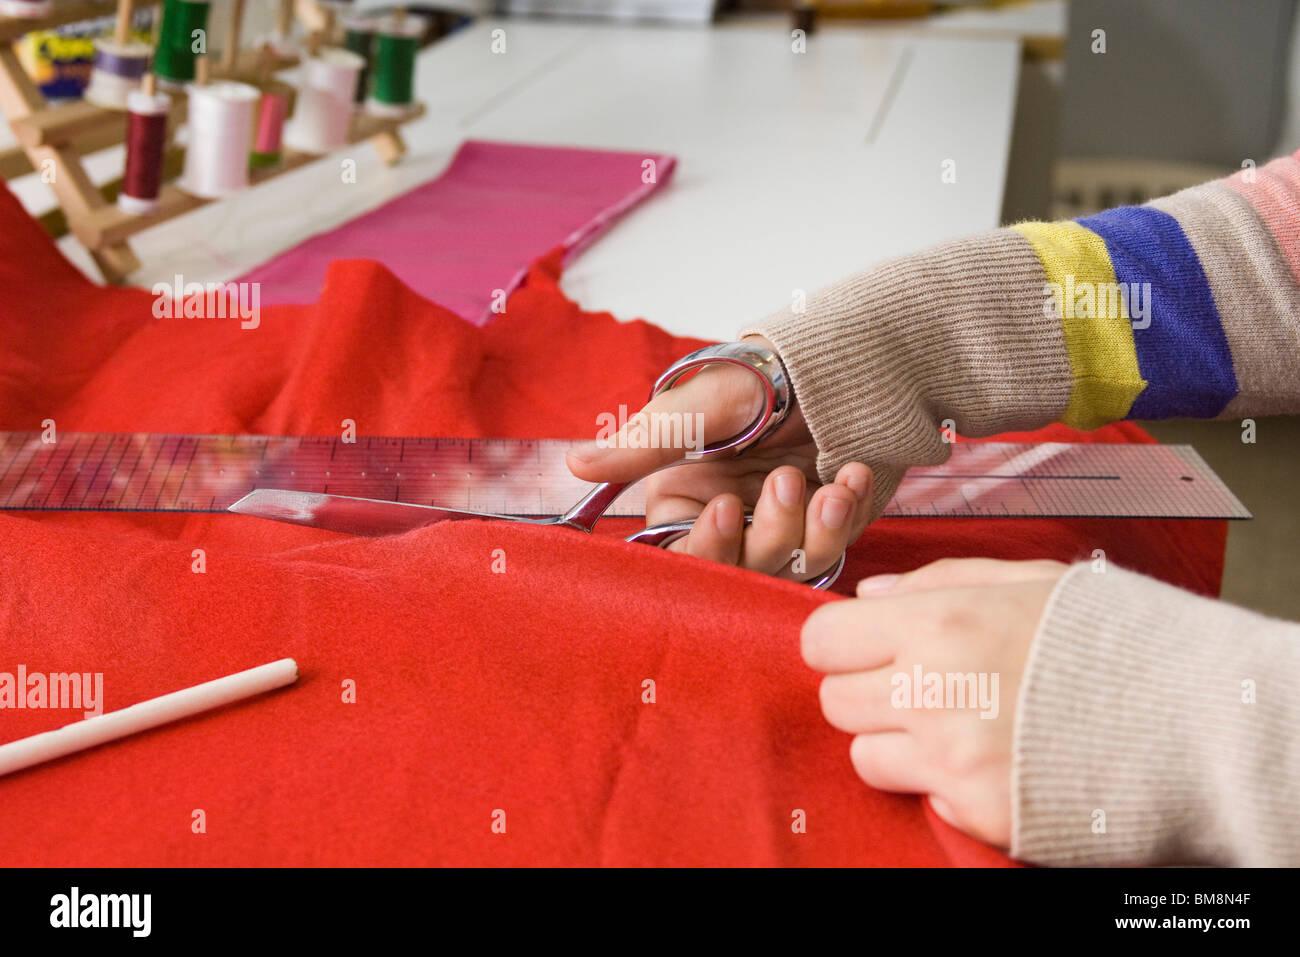 Cutting fabric - Stock Image